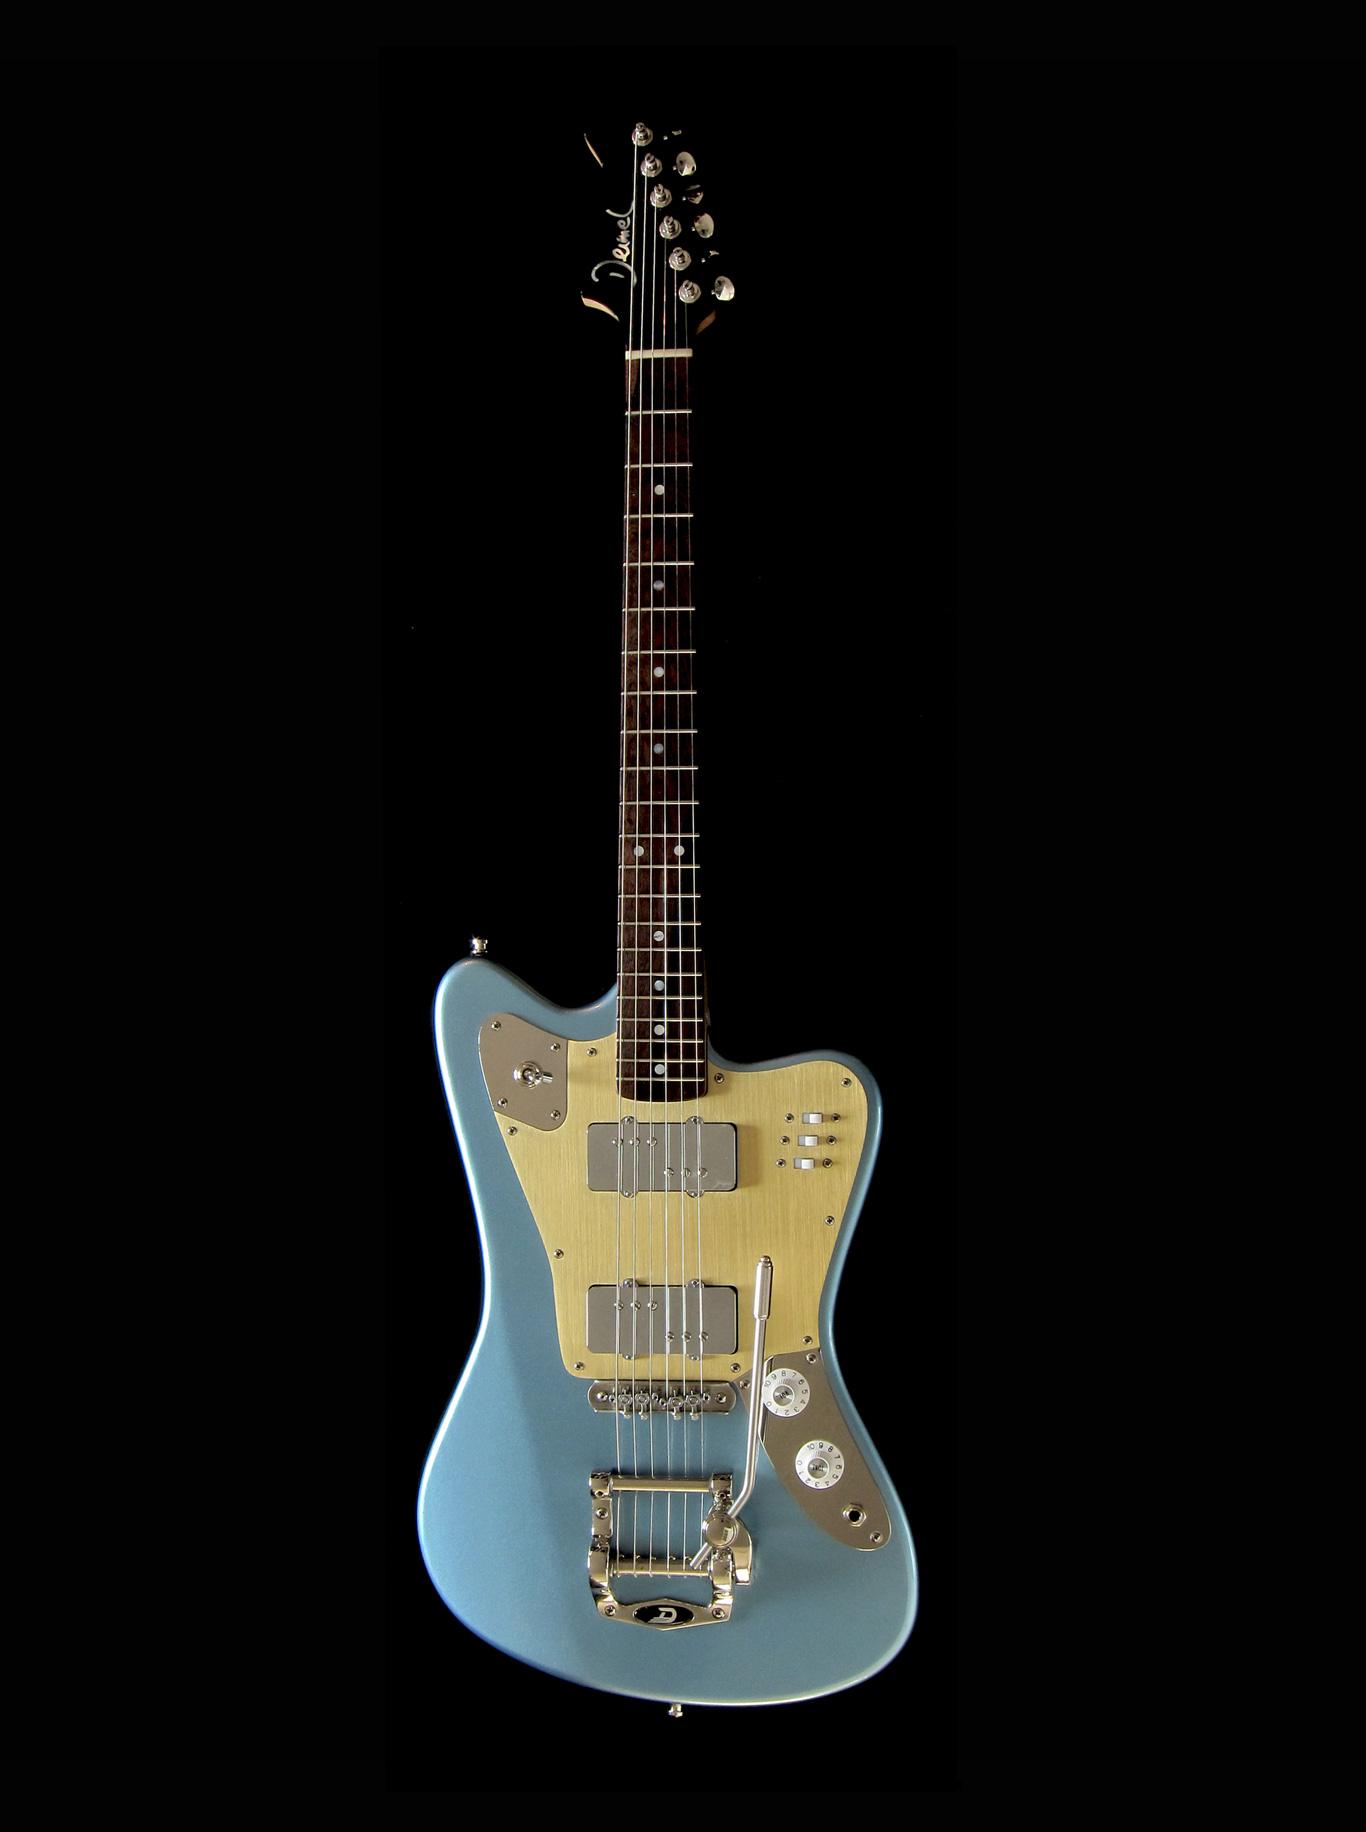 Deimel Firestar »Classic«, Color »Moon Dust Blue«